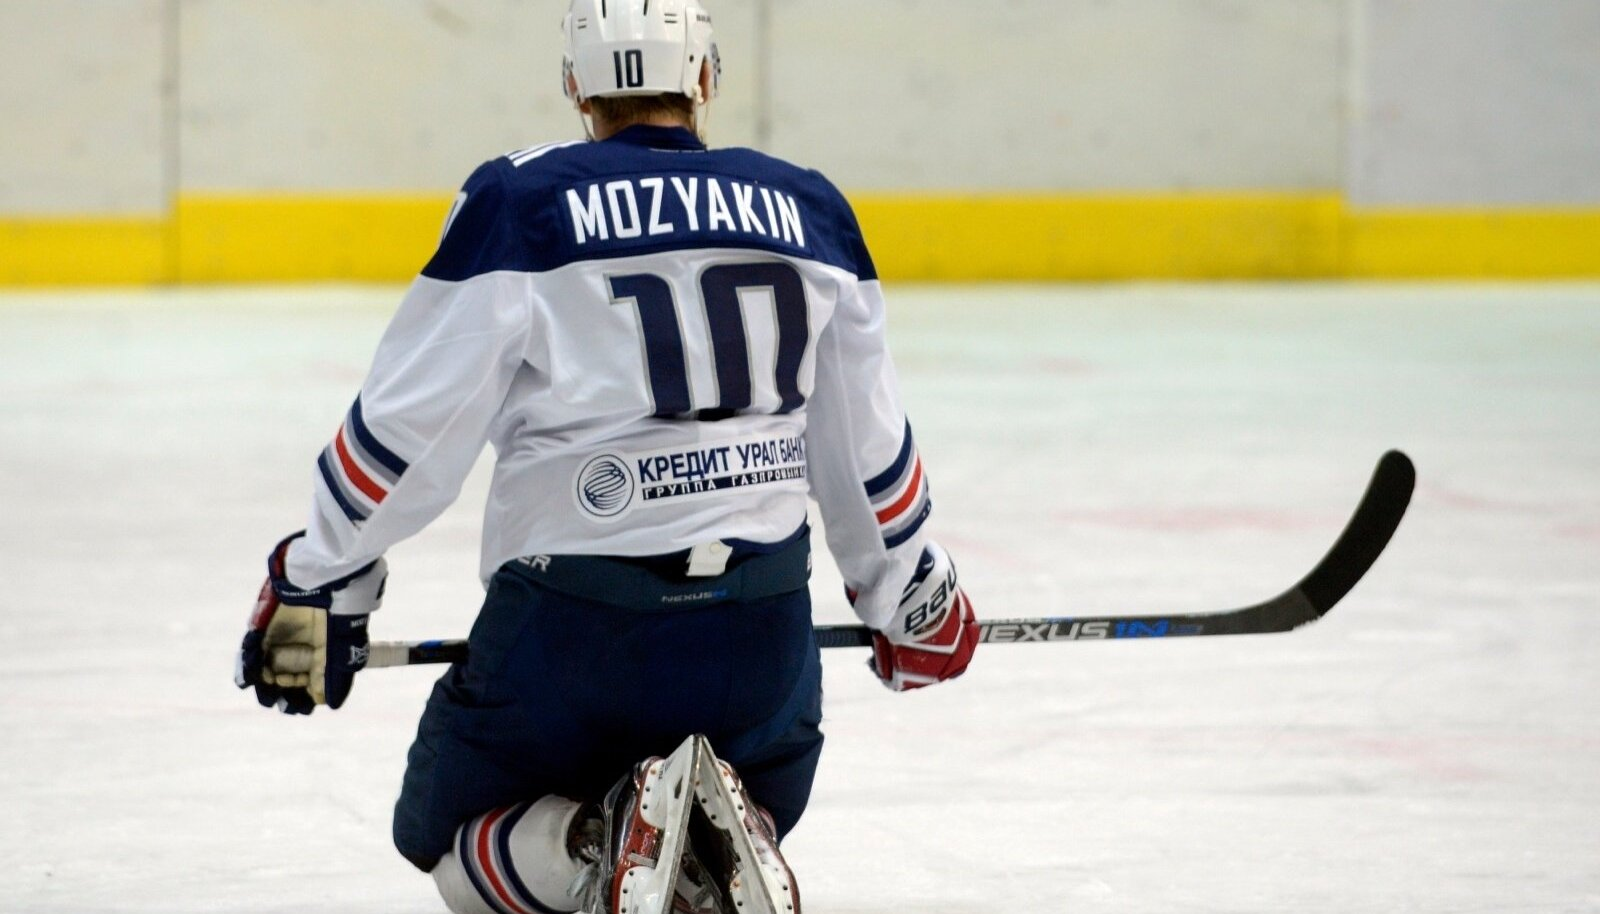 KHL GAME BETWEEN DINAMO RIGA AND METALLURG MAGNITOGORSK